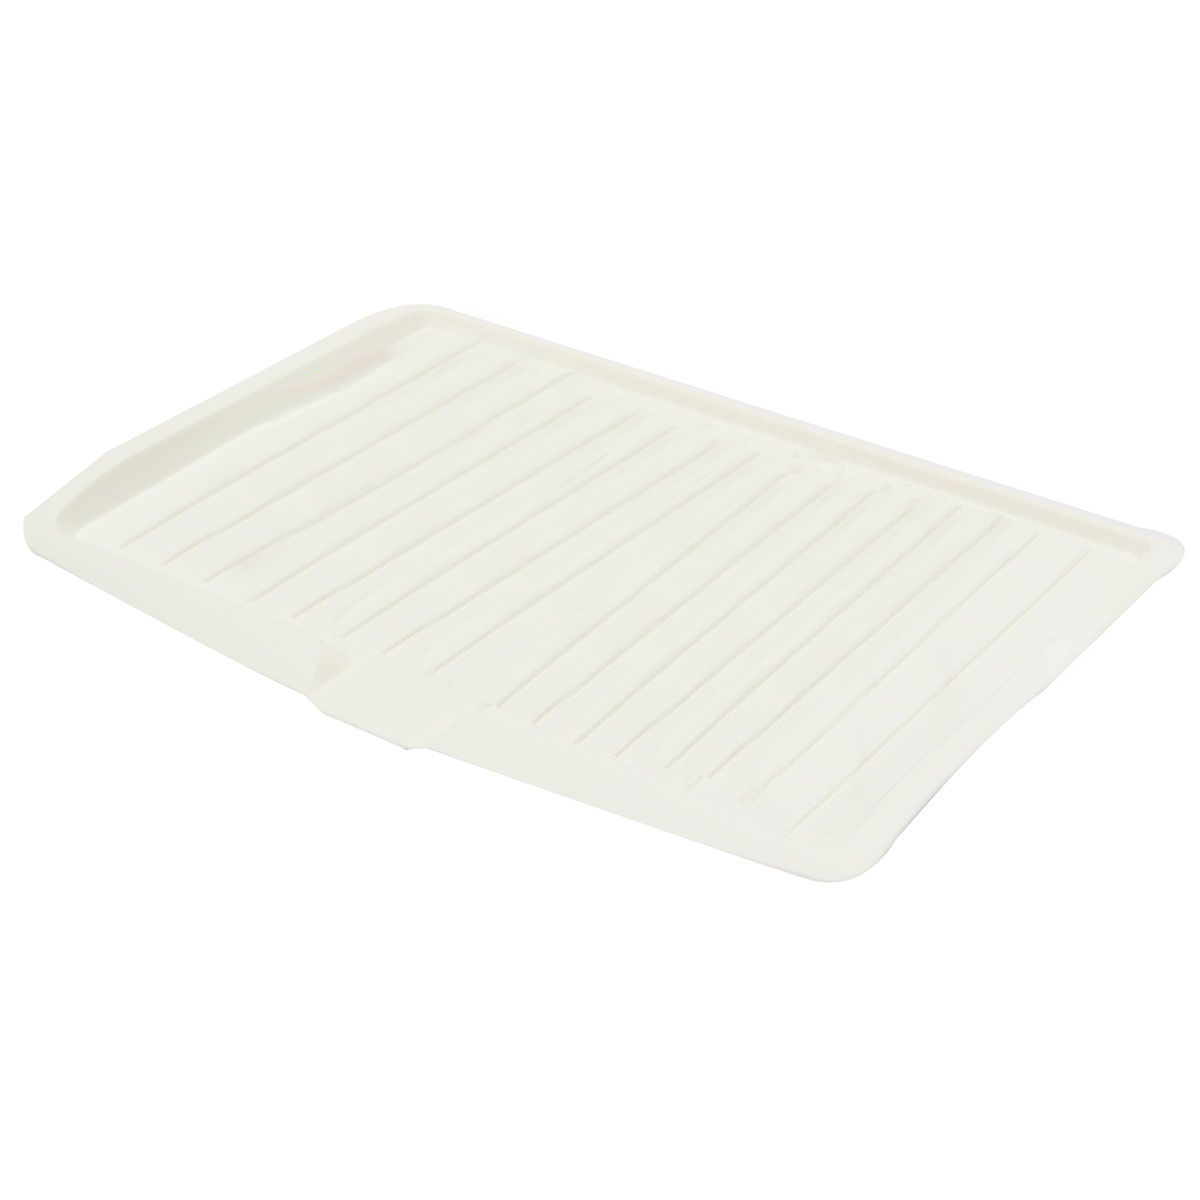 PHFU Plastic Dish Drainer Drip Tray Plate Cutlery Rack Kitchen Sink Rack  Holder Large White